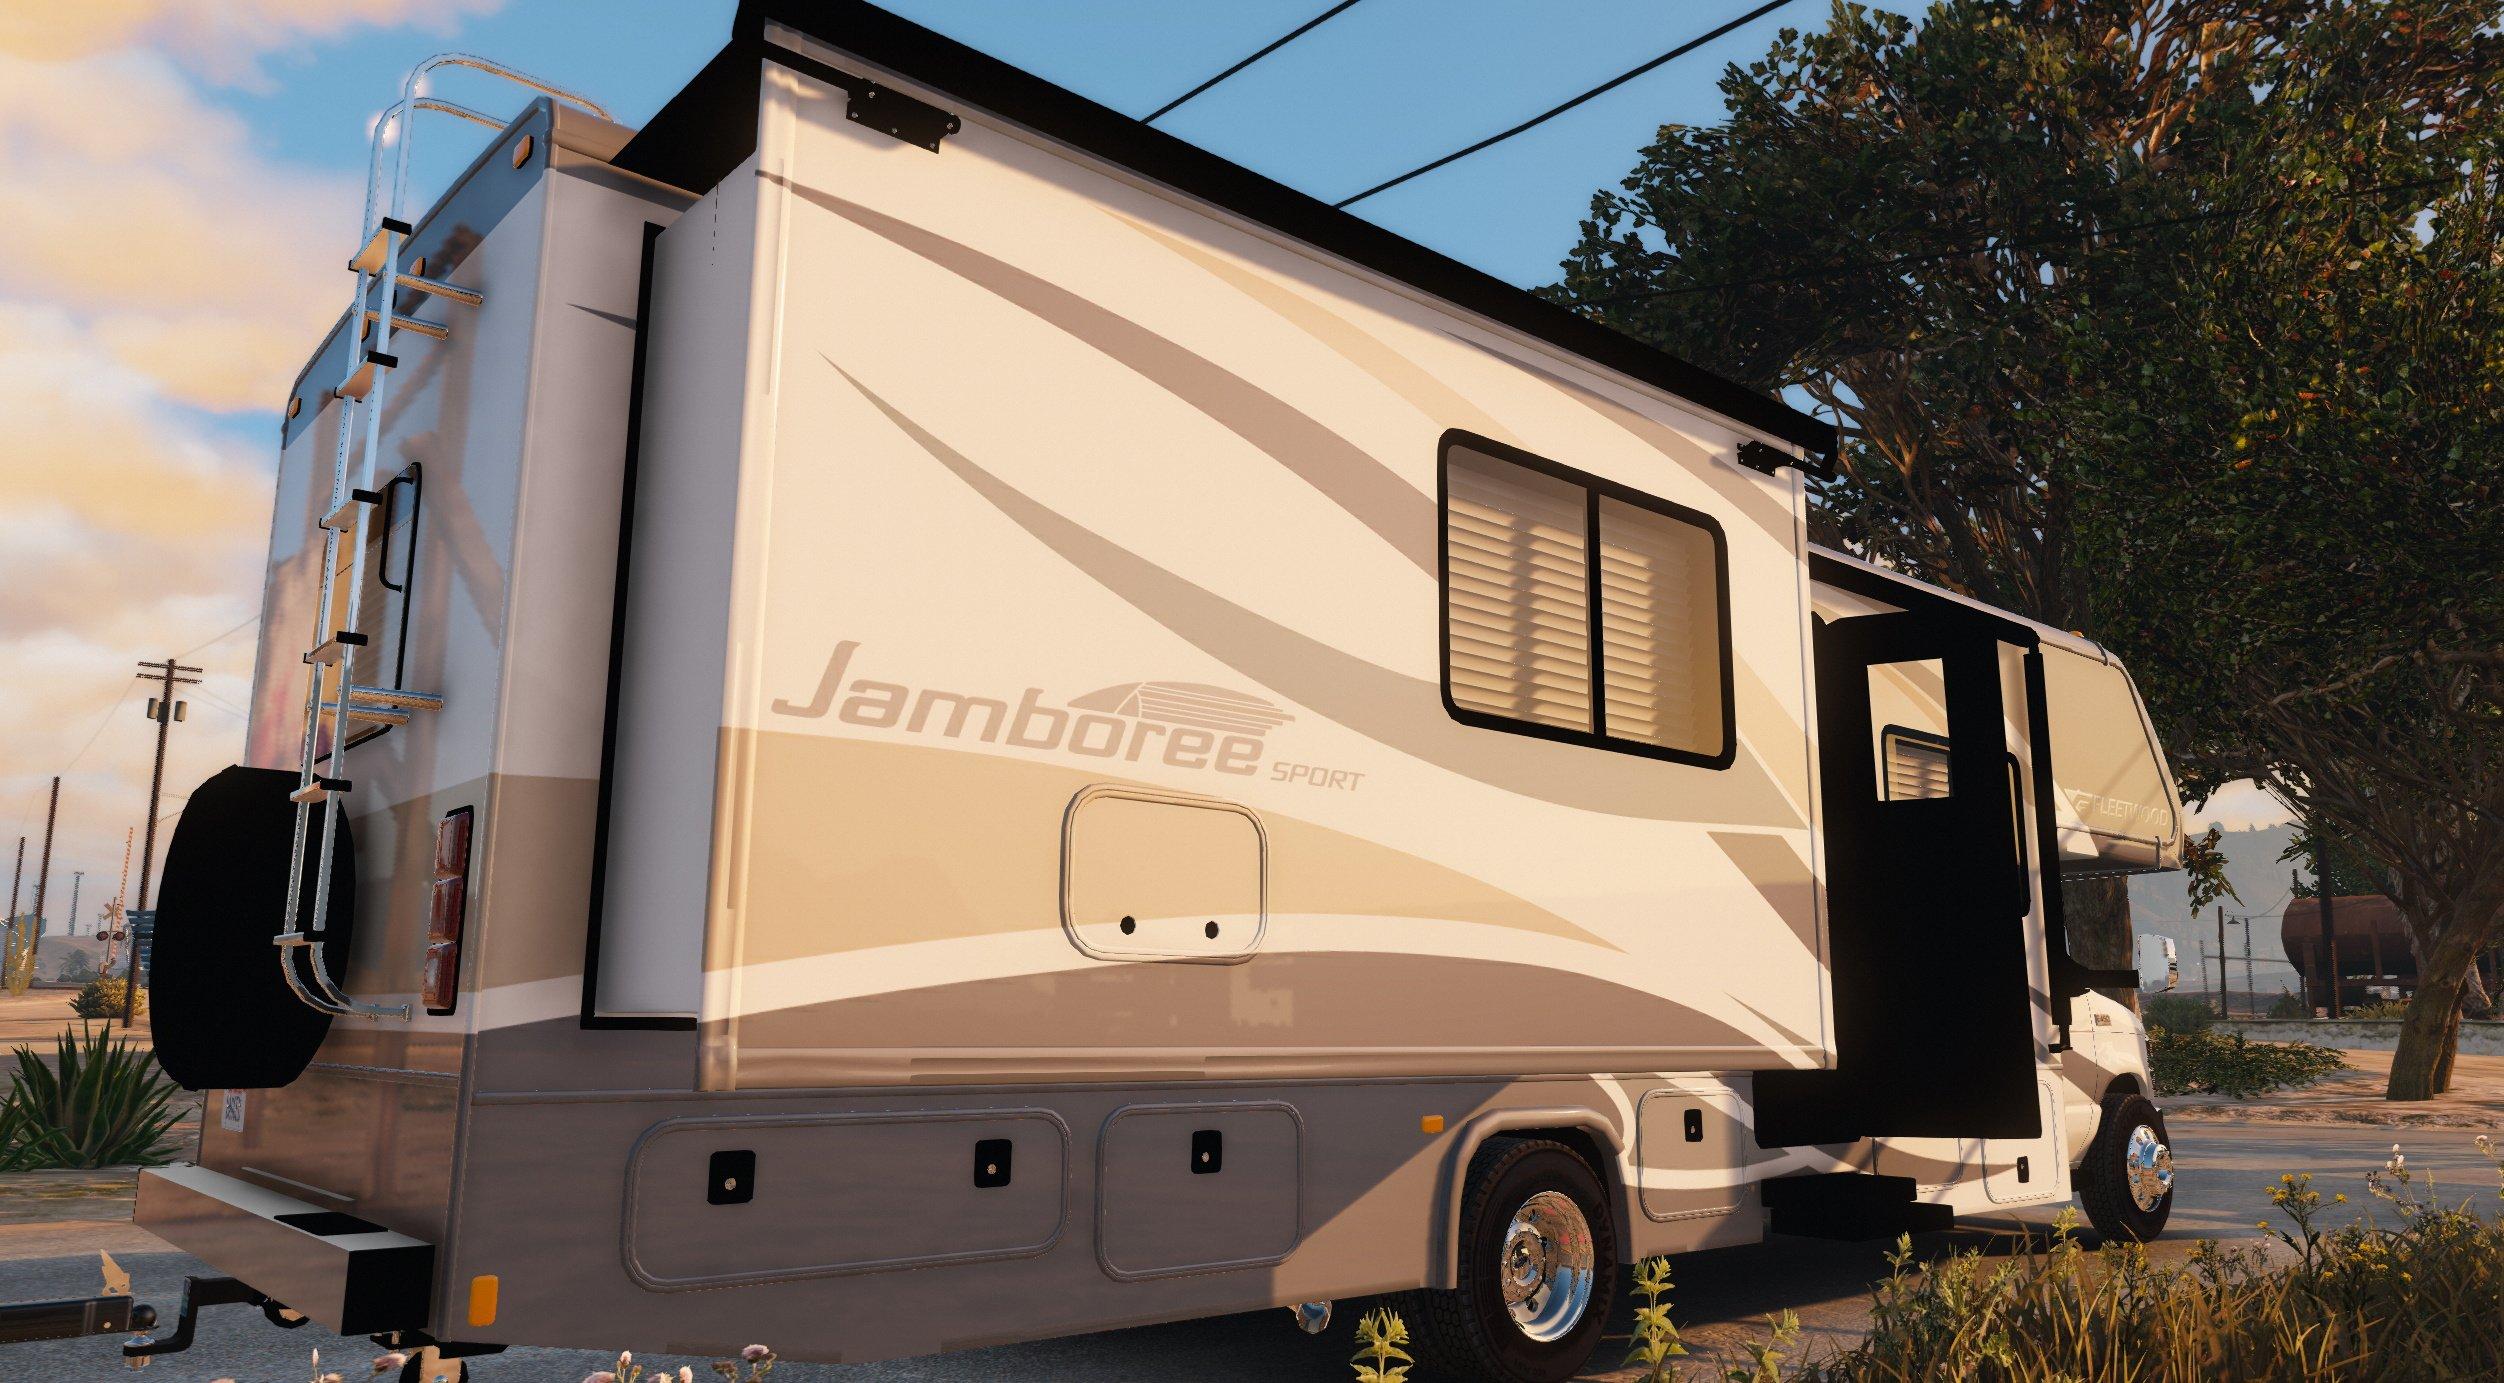 17 Fleetwood Jamboree RV [Add-On][Livery] - GTA5-Mods com